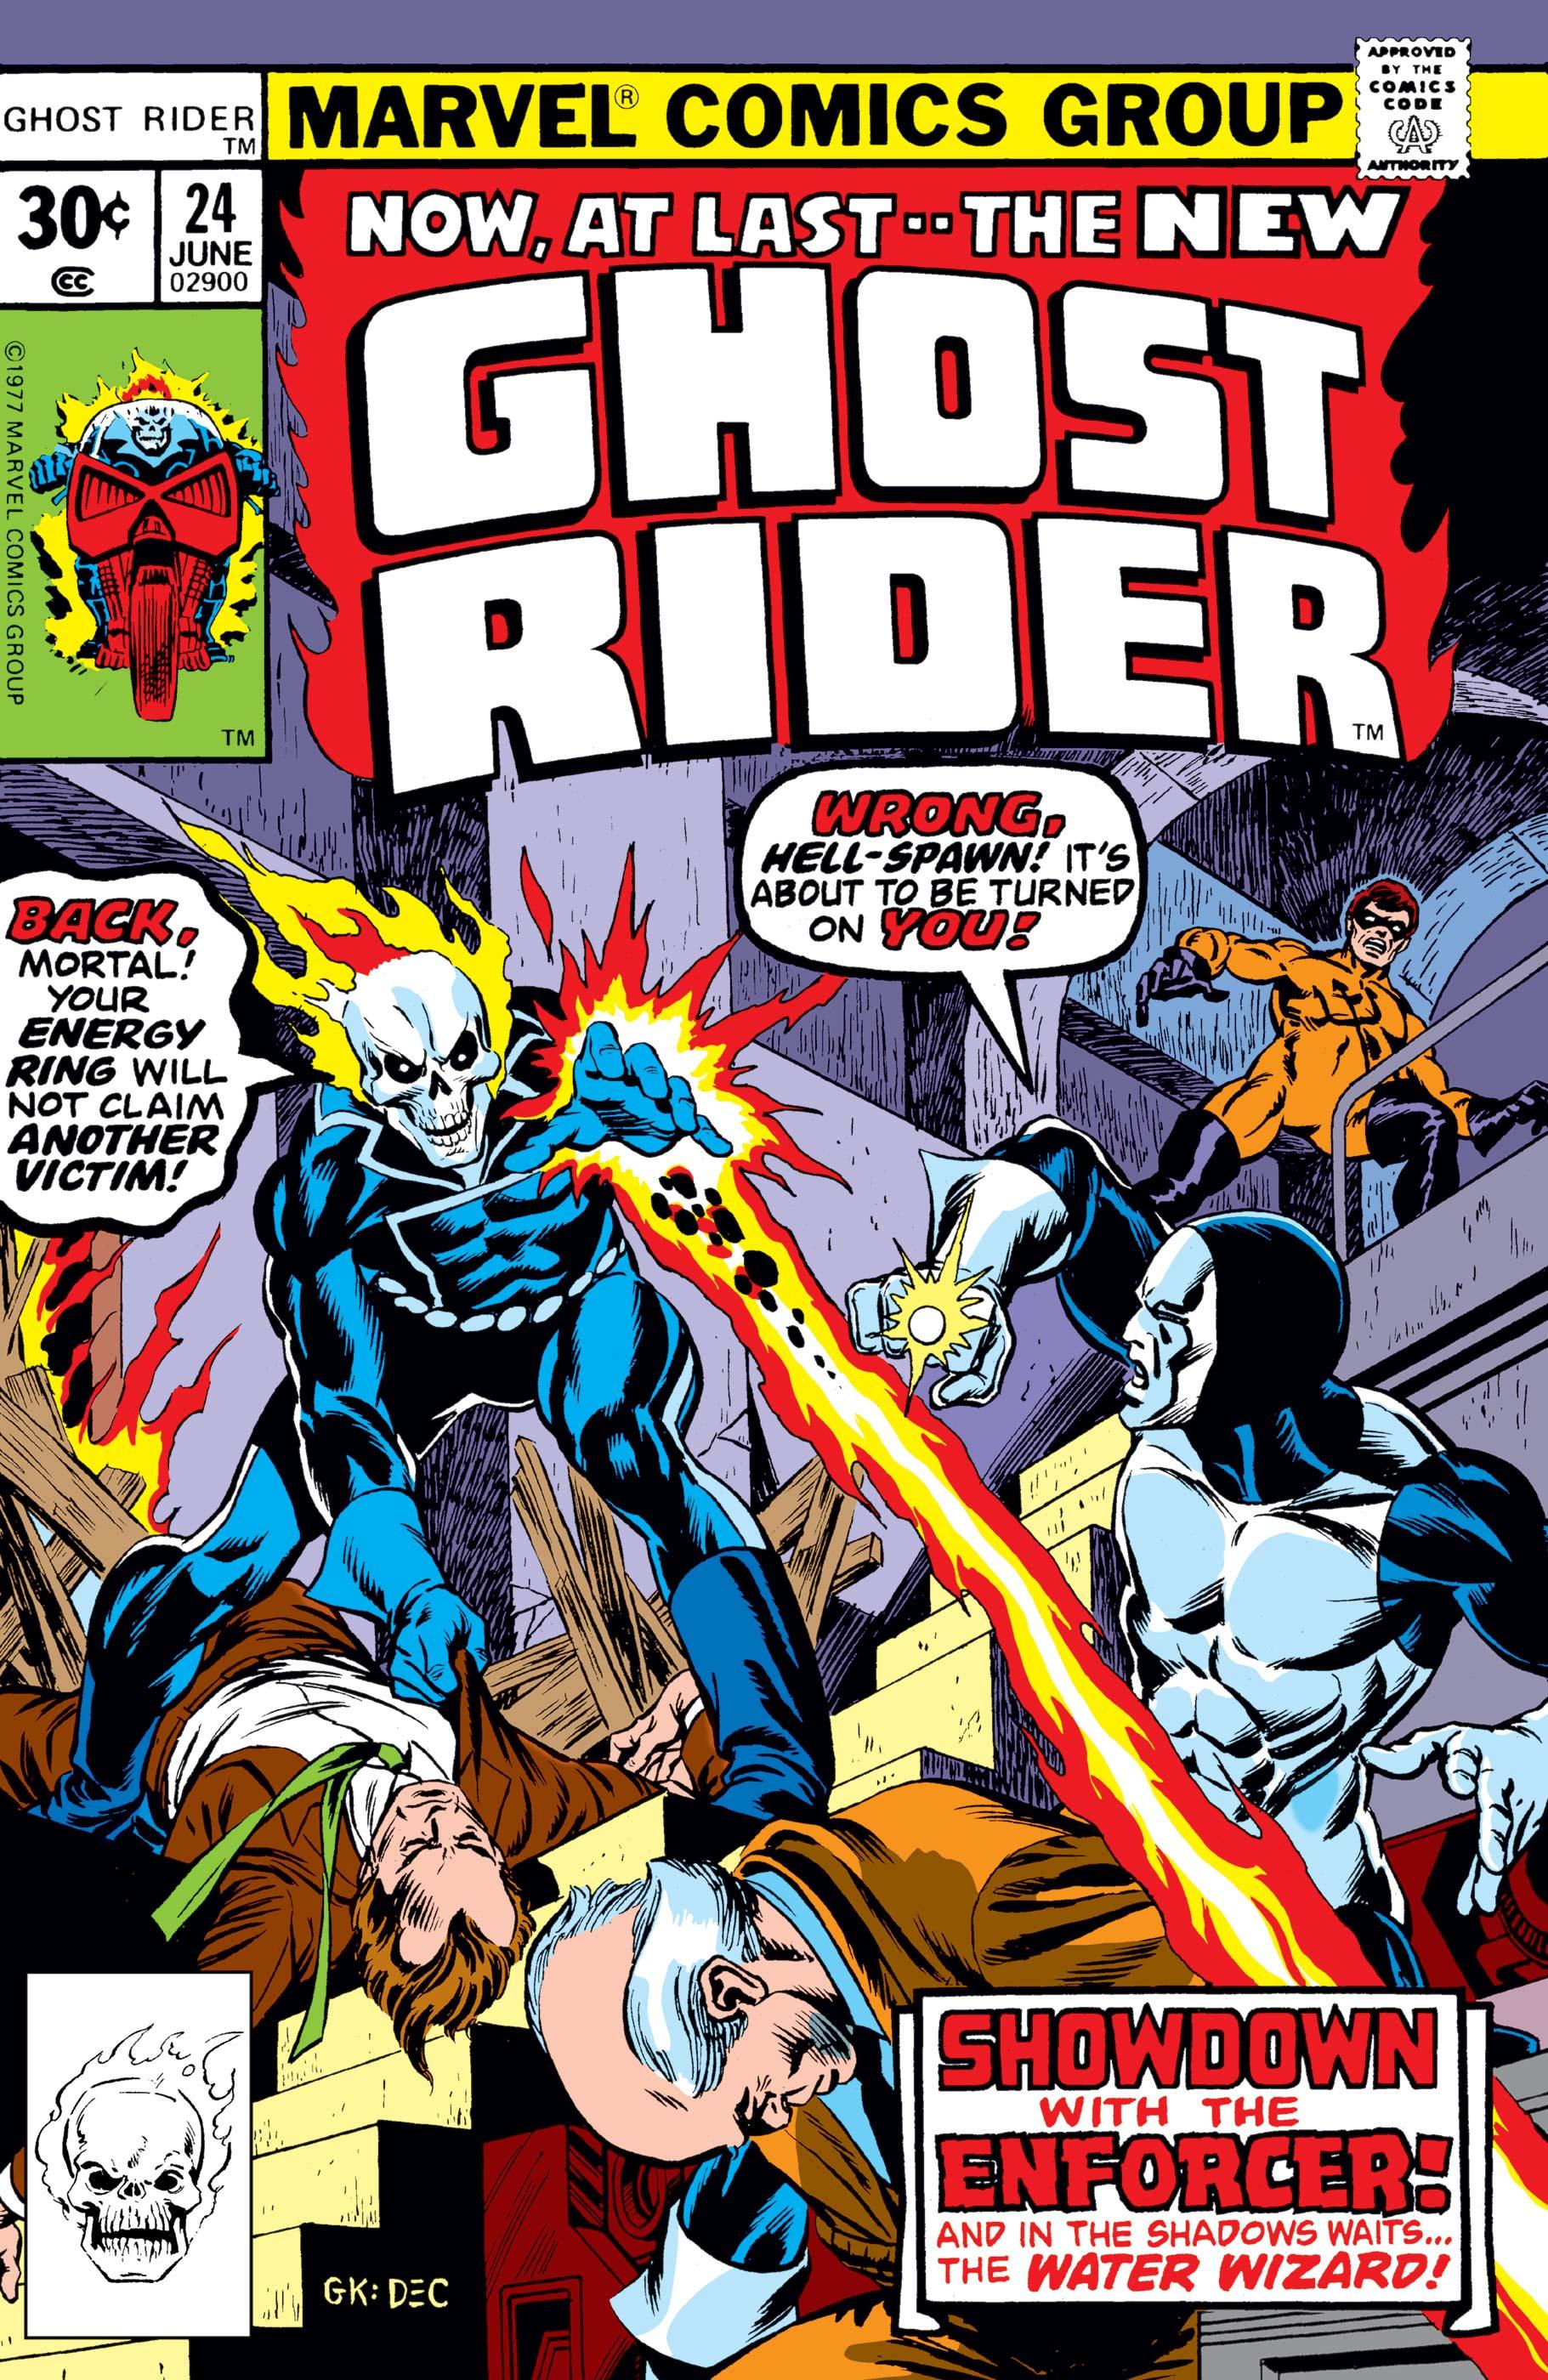 Ghost Rider (1973) #24